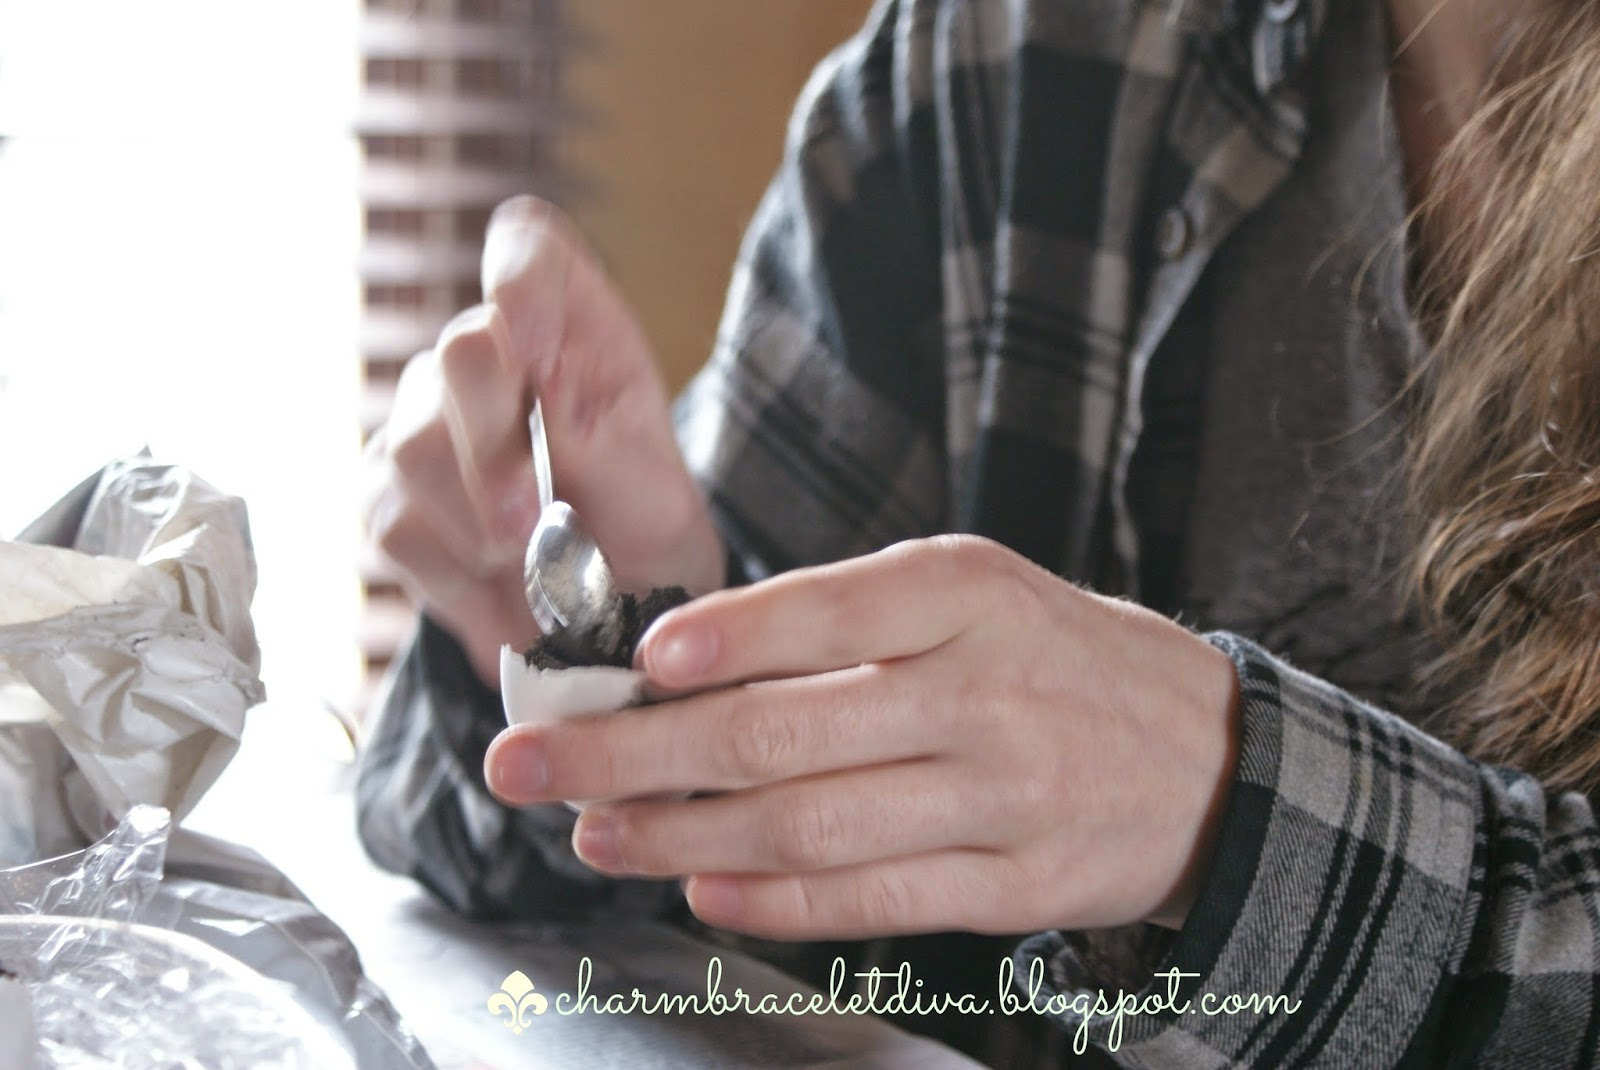 hands spooning dirt into egg shells